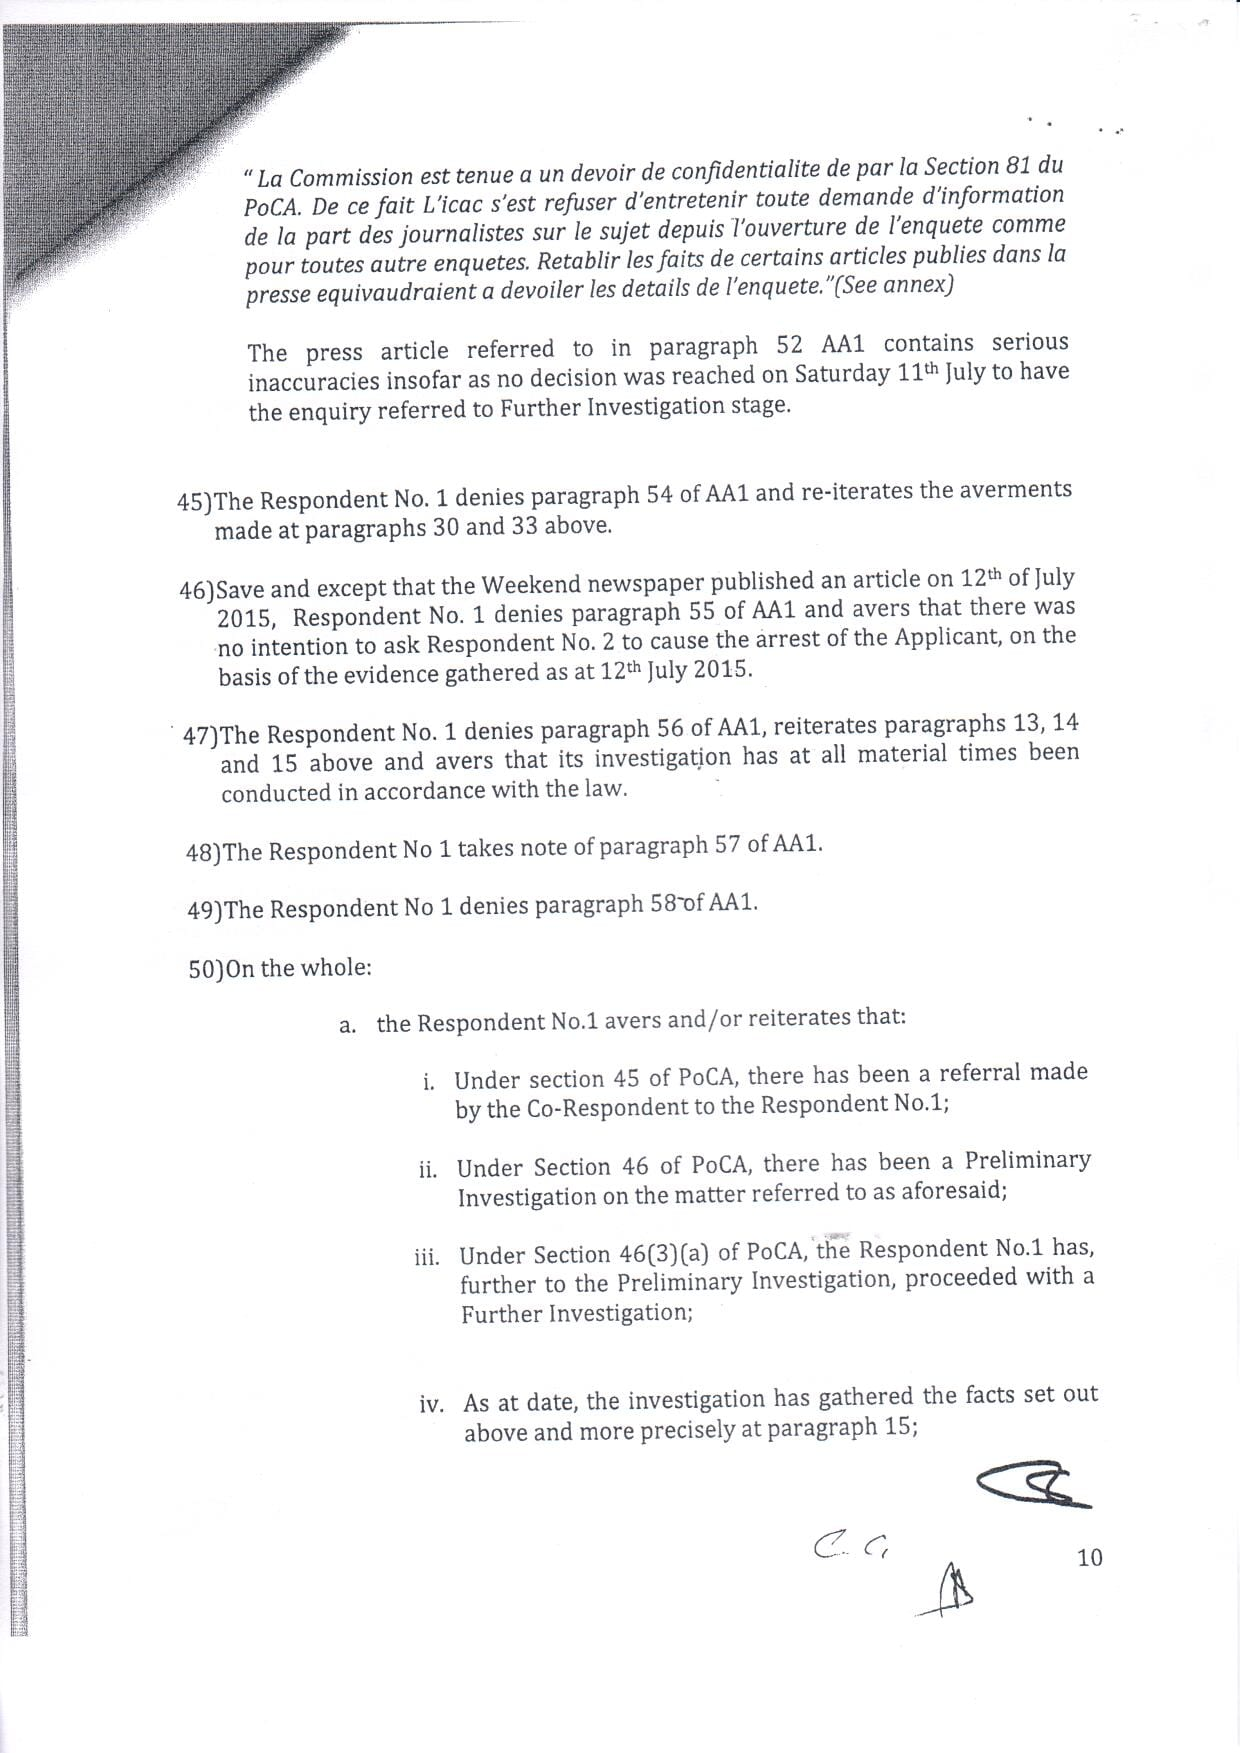 affidavit ICAC boolell 10